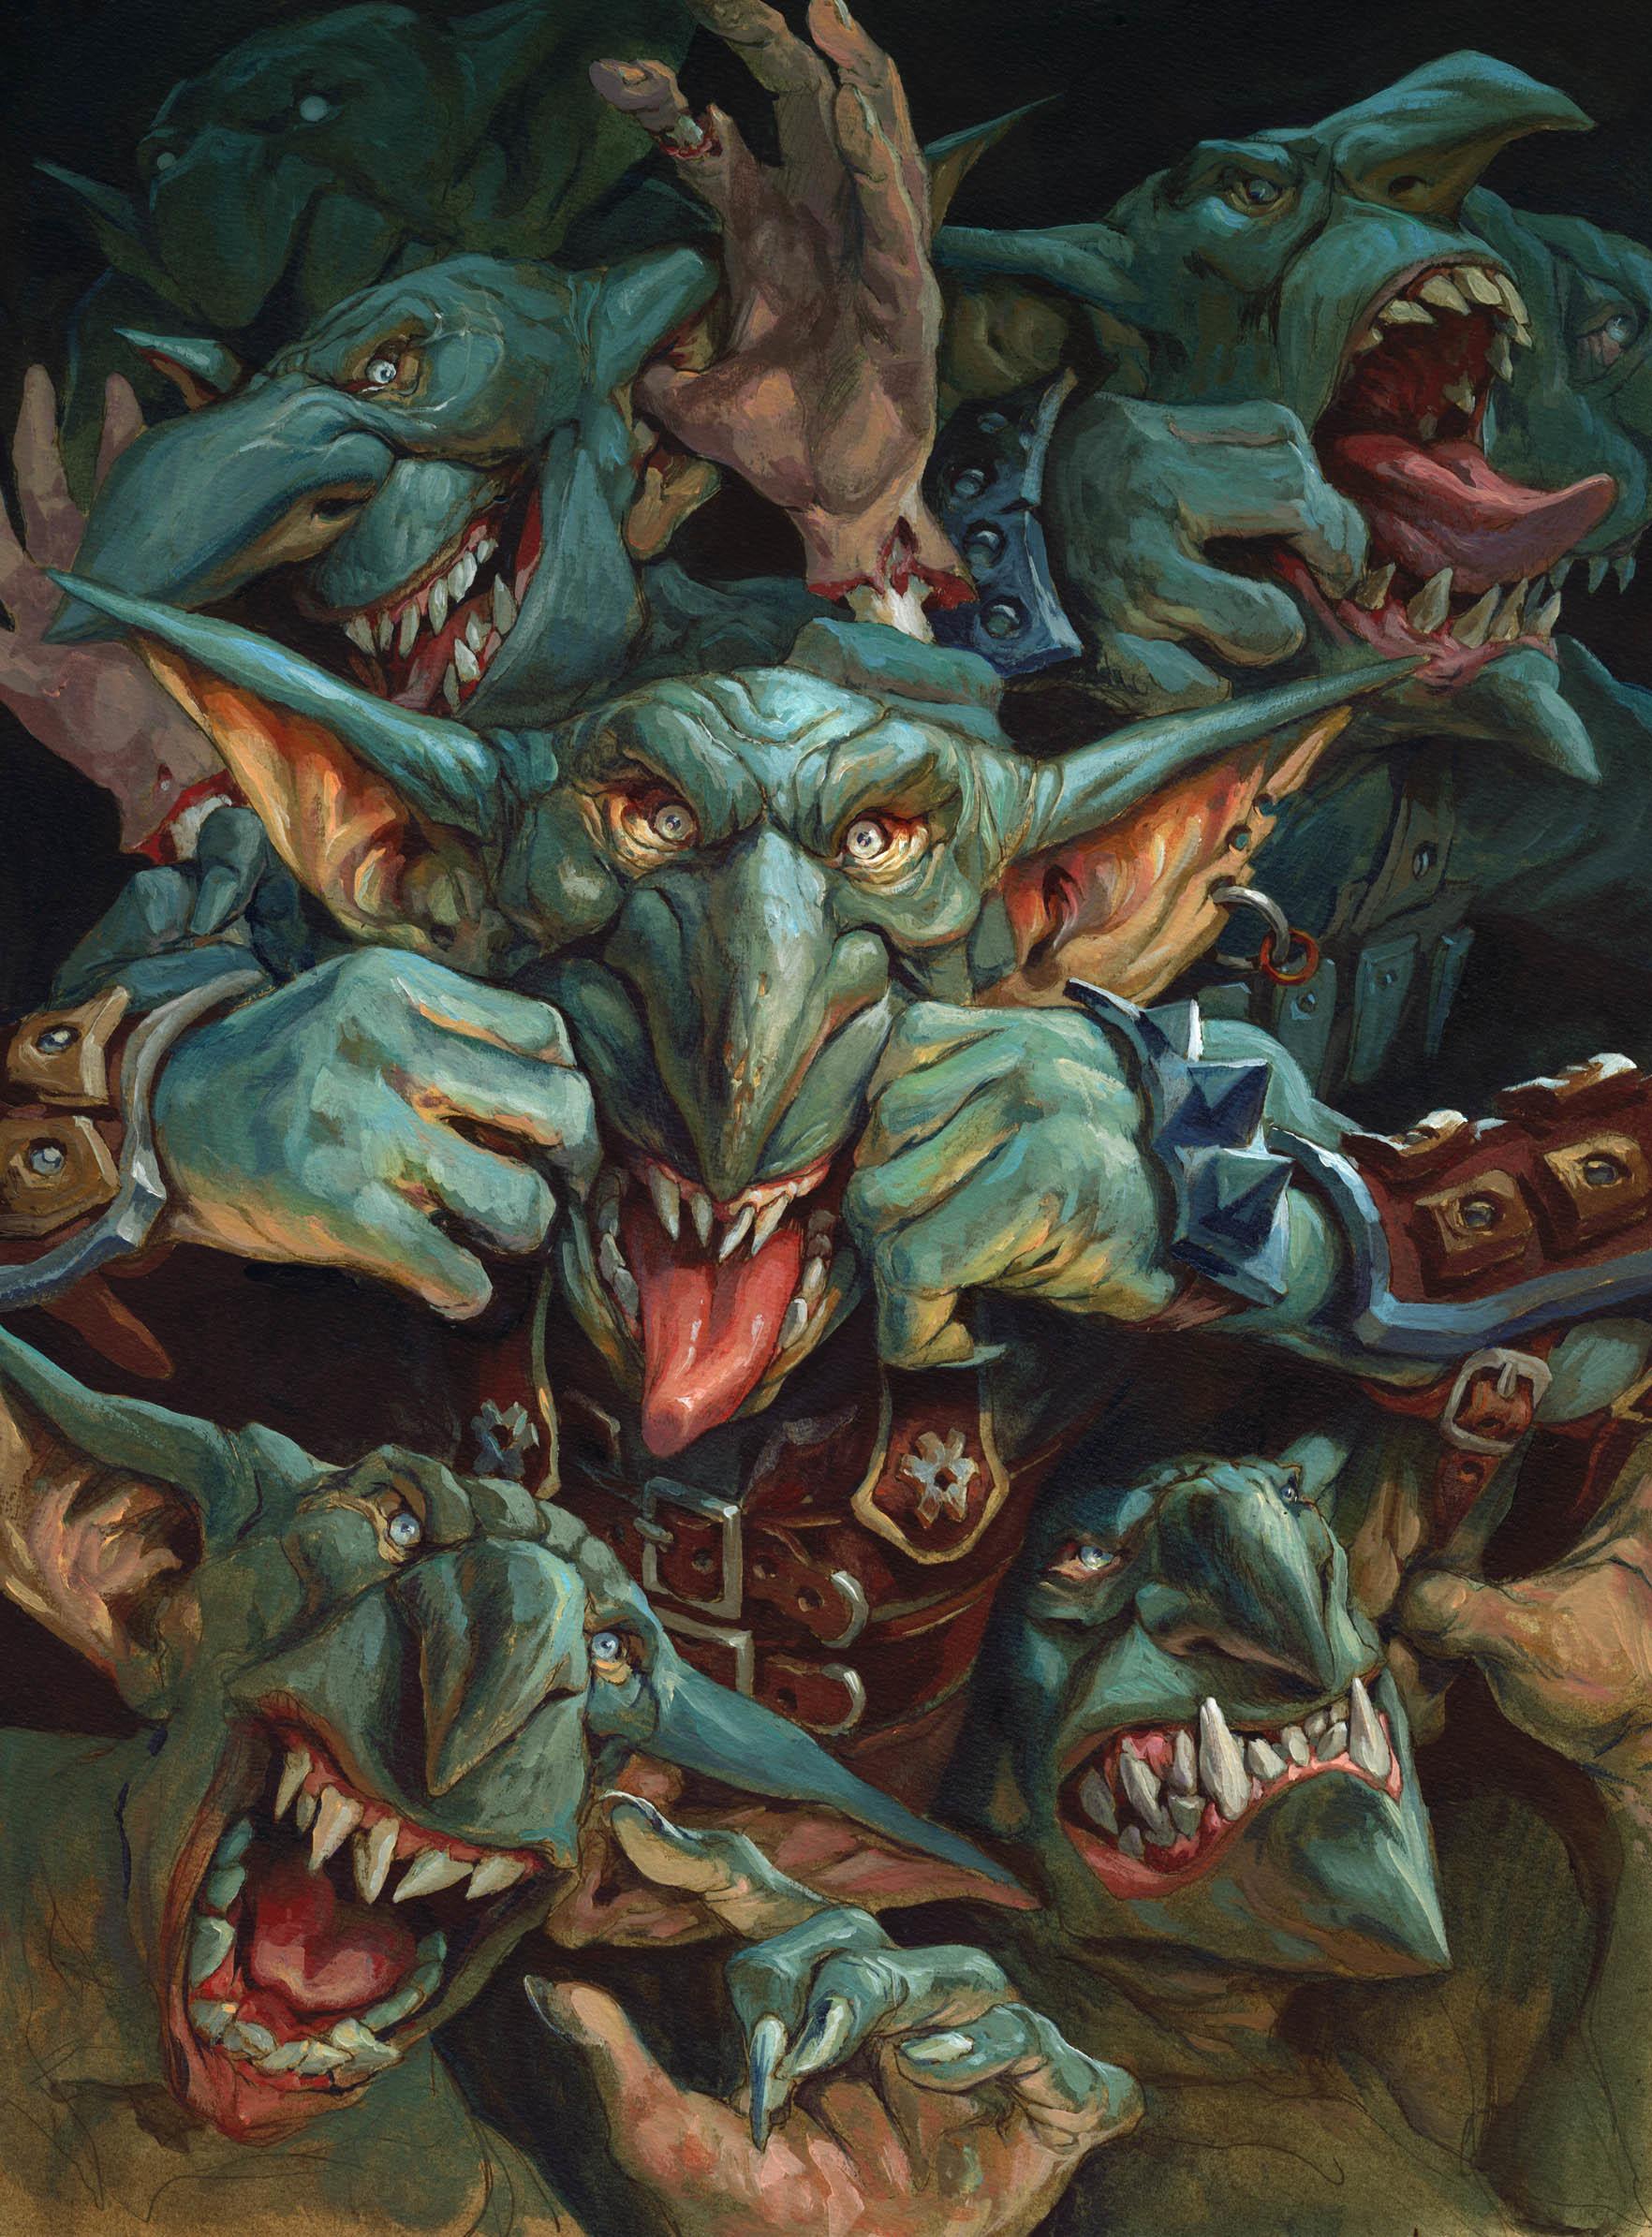 jesper-ejsing-art-id-149172-taunting-goblins-final.jpg.dfc91d9a1387afb63fe56ecd4d1083ae.jpg